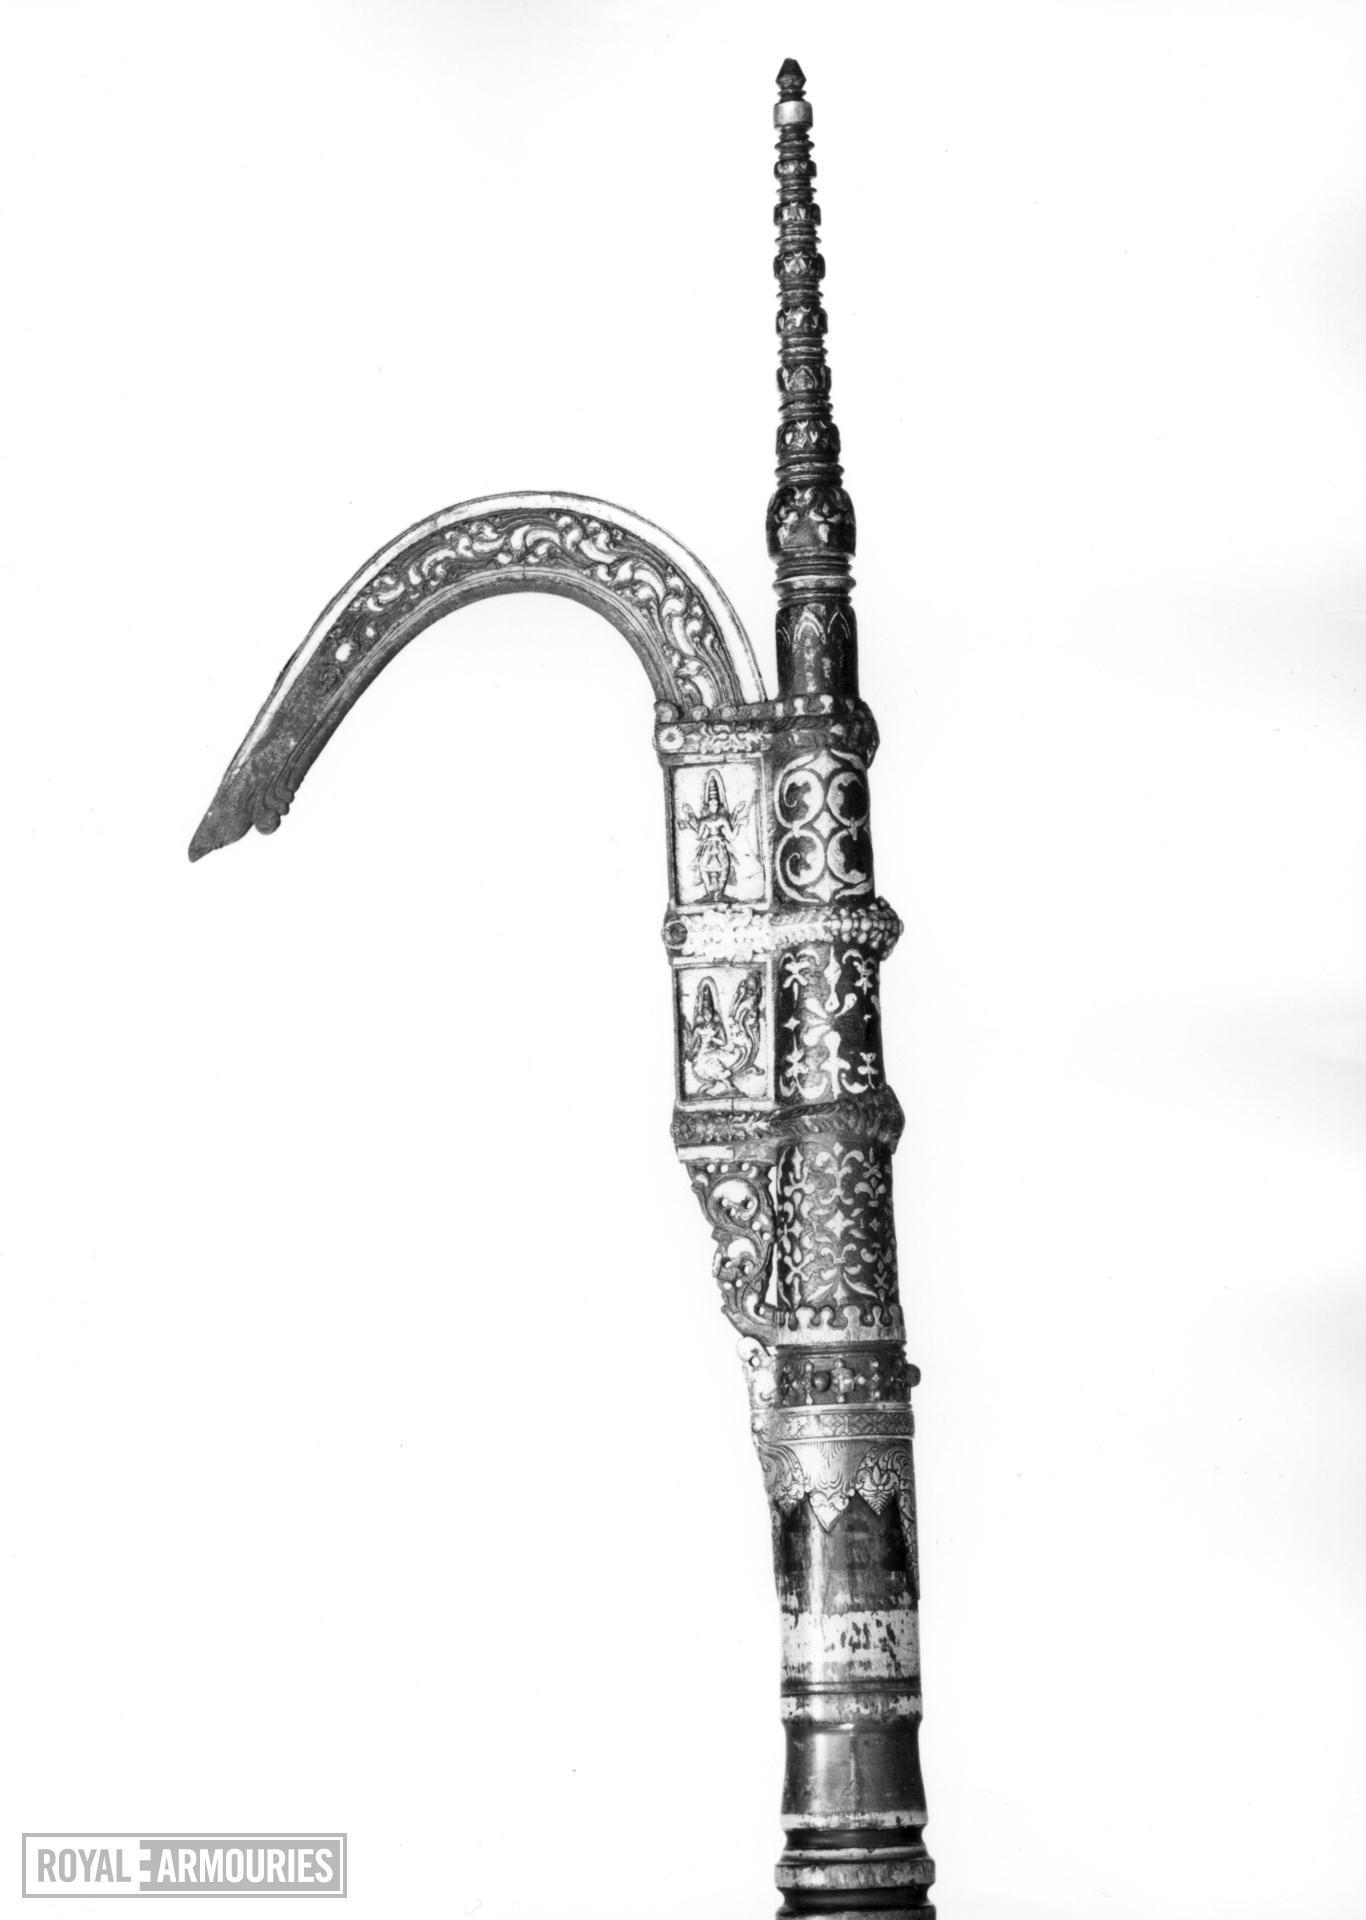 Elephant goad (ankus)